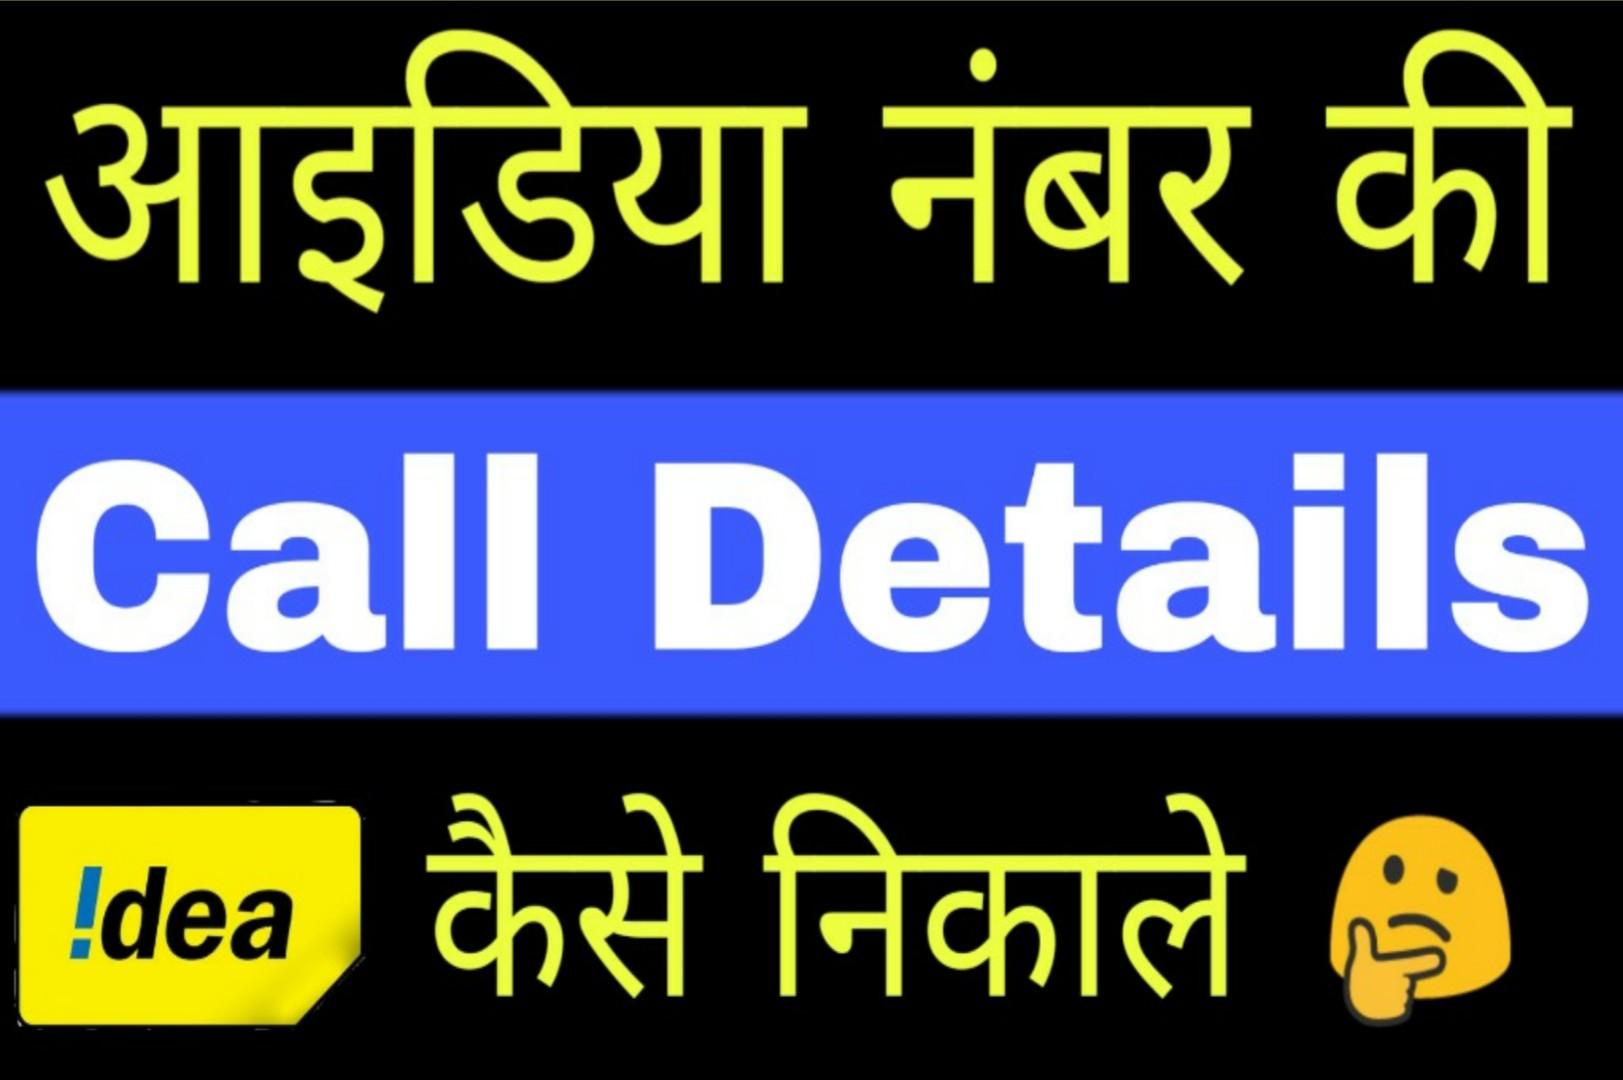 Kisi Bhi Idea Number Ki Call Details Kaise Nikale